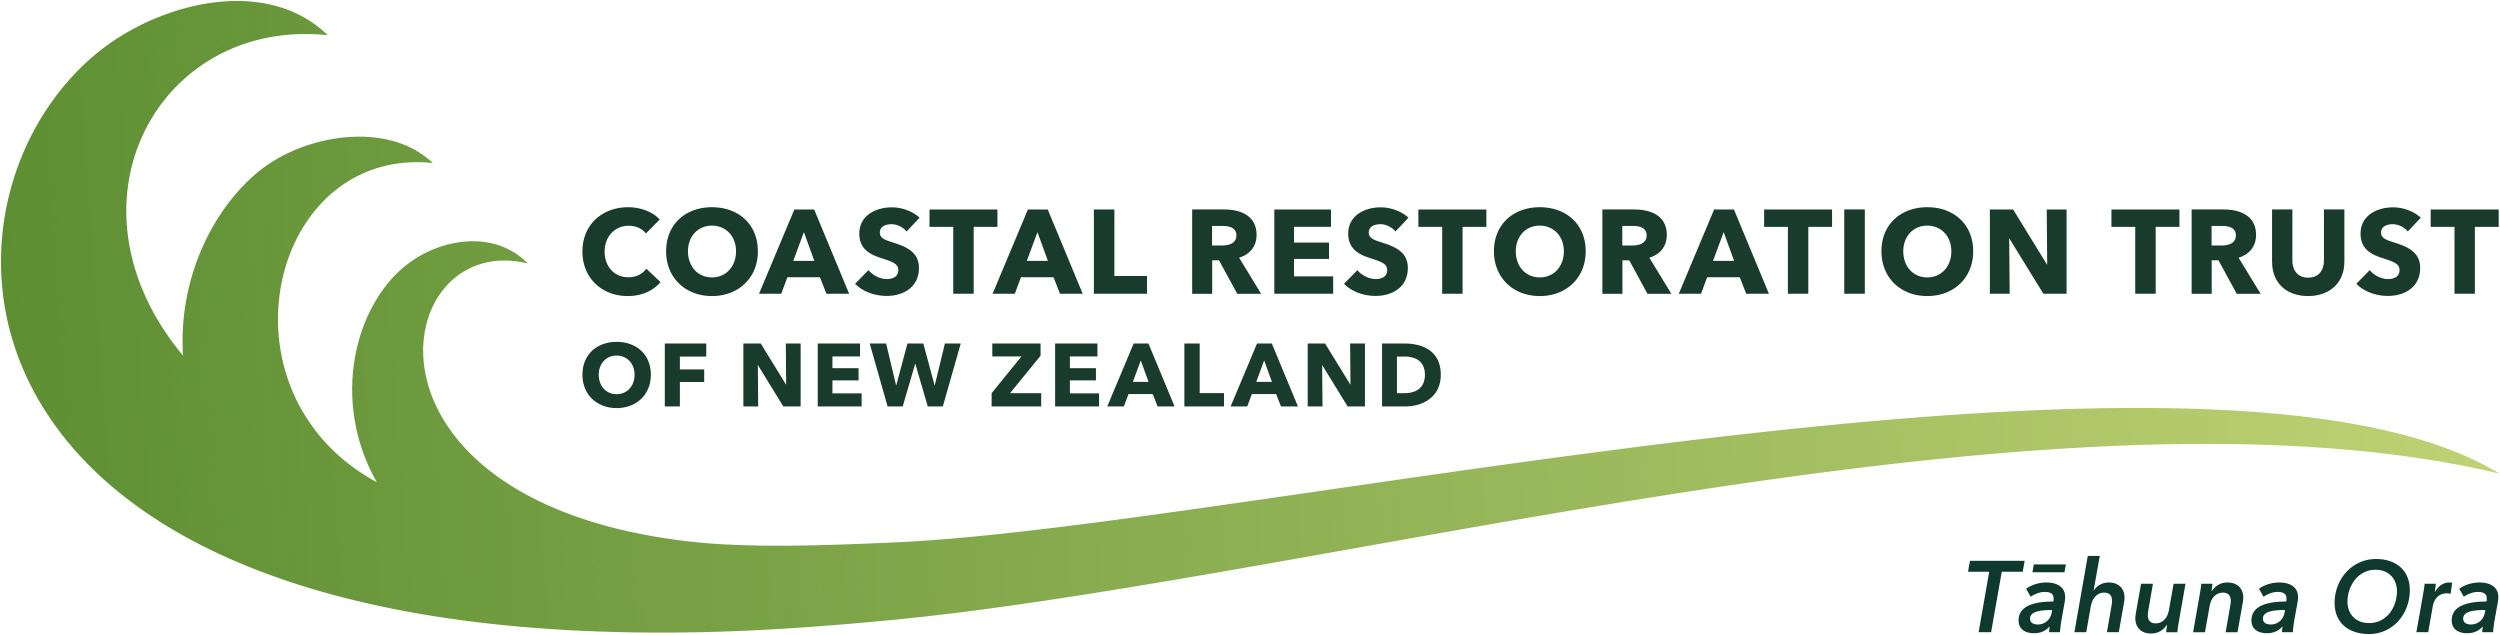 Resilient Coasts, Resilient Communities - Petone 2018 logo